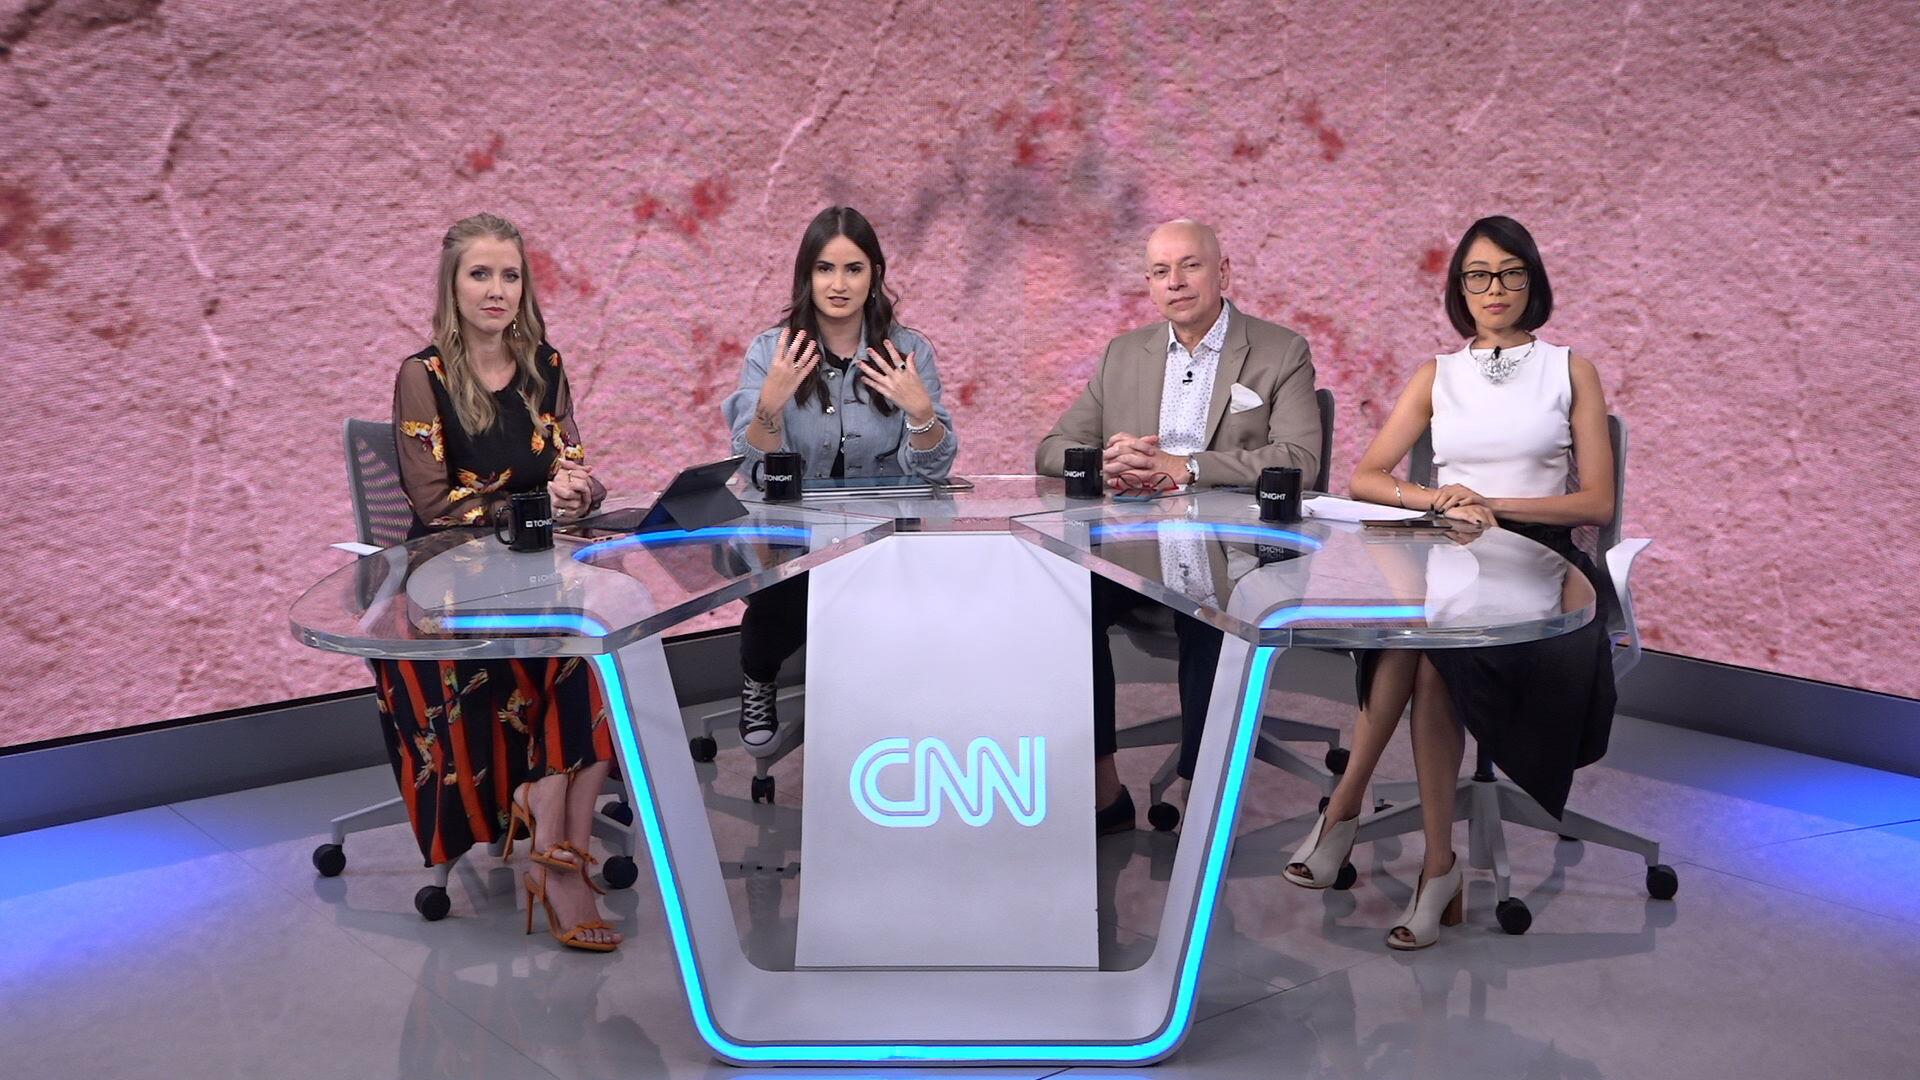 CNN Tonight, apresentado por Mari Palma, Gabriela Prioli e Leandro Karnal